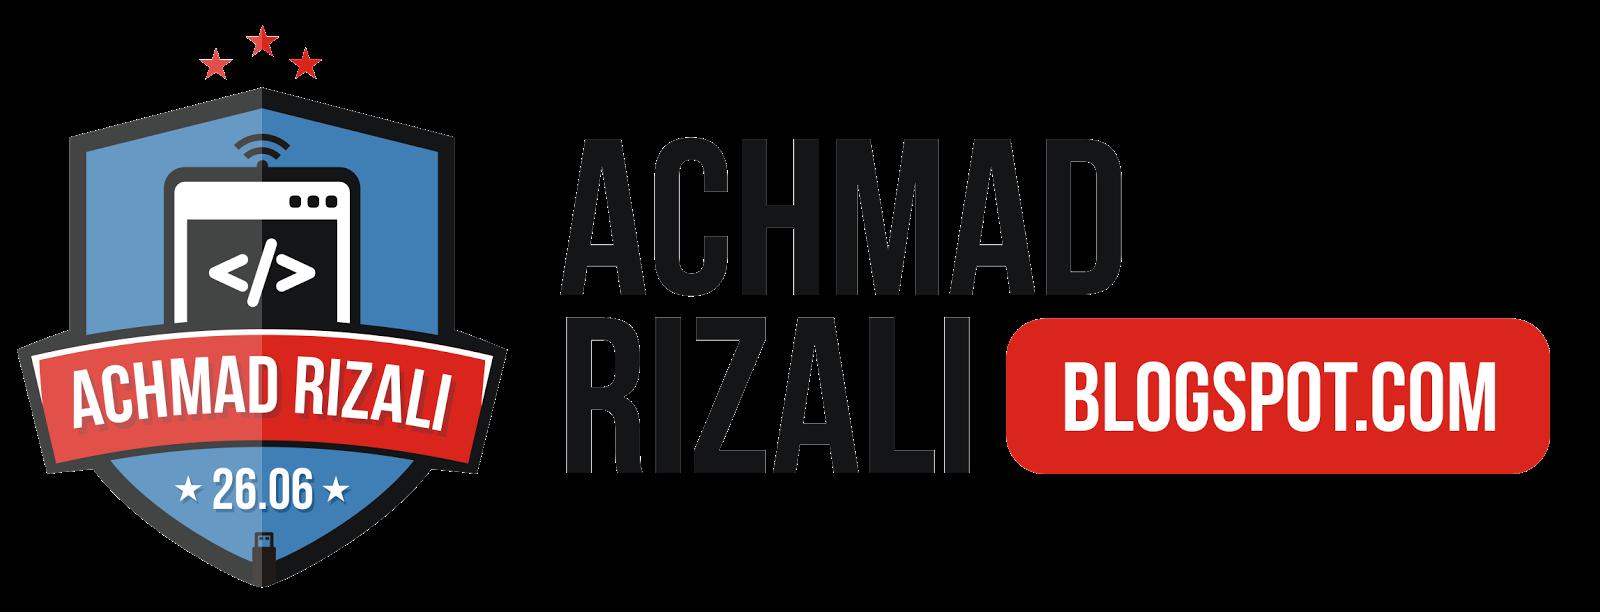 Achmad Rizali